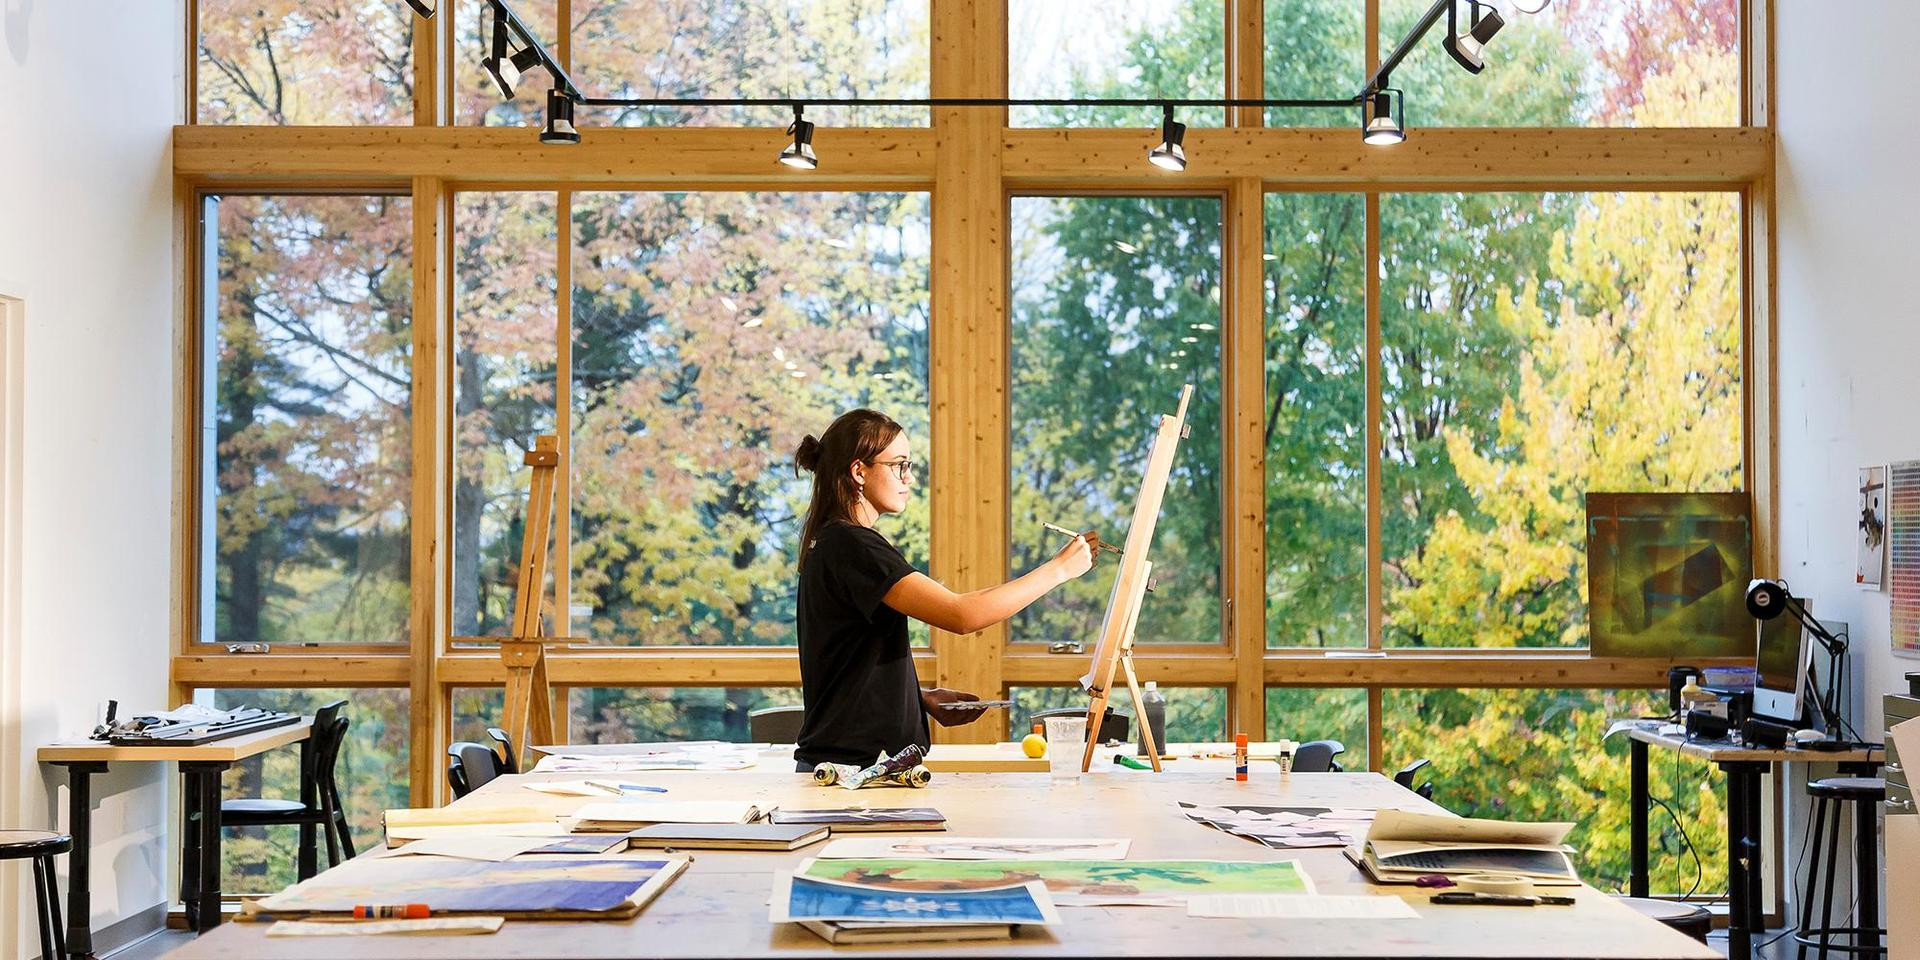 Art studio in the Catherine Houghton Arts Center.